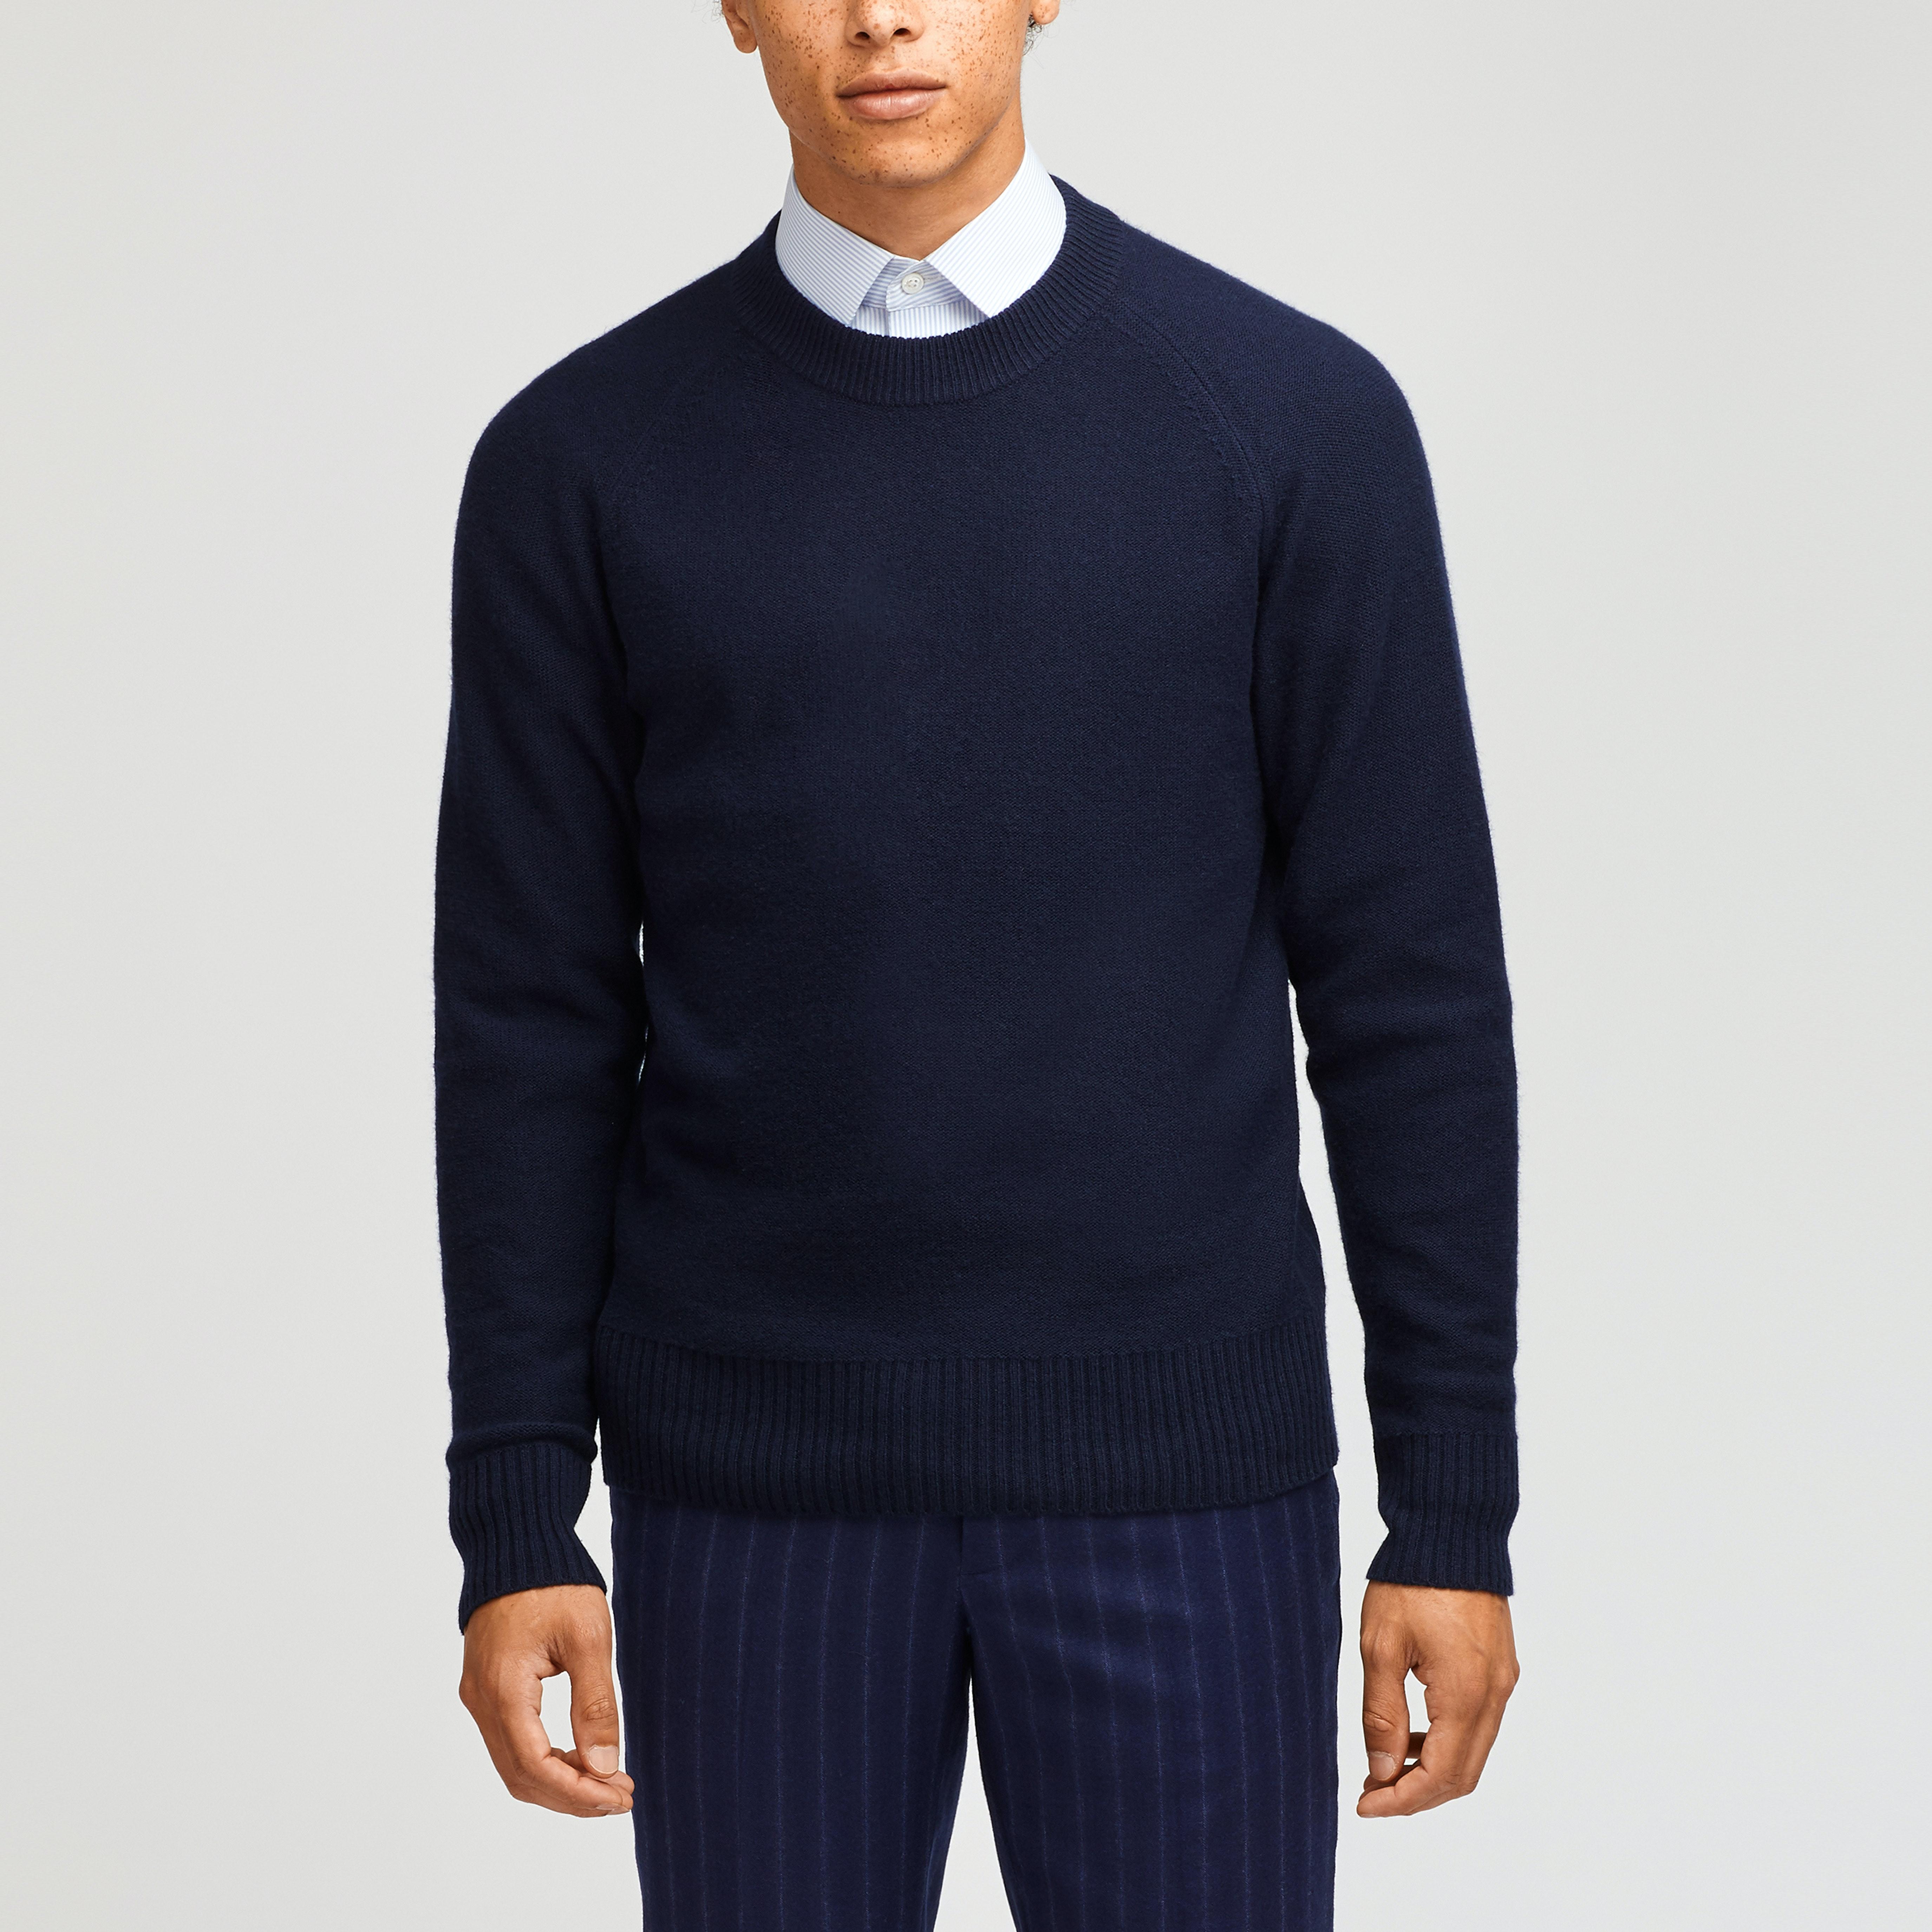 Wool Blend Raglan Crew Neck Sweater